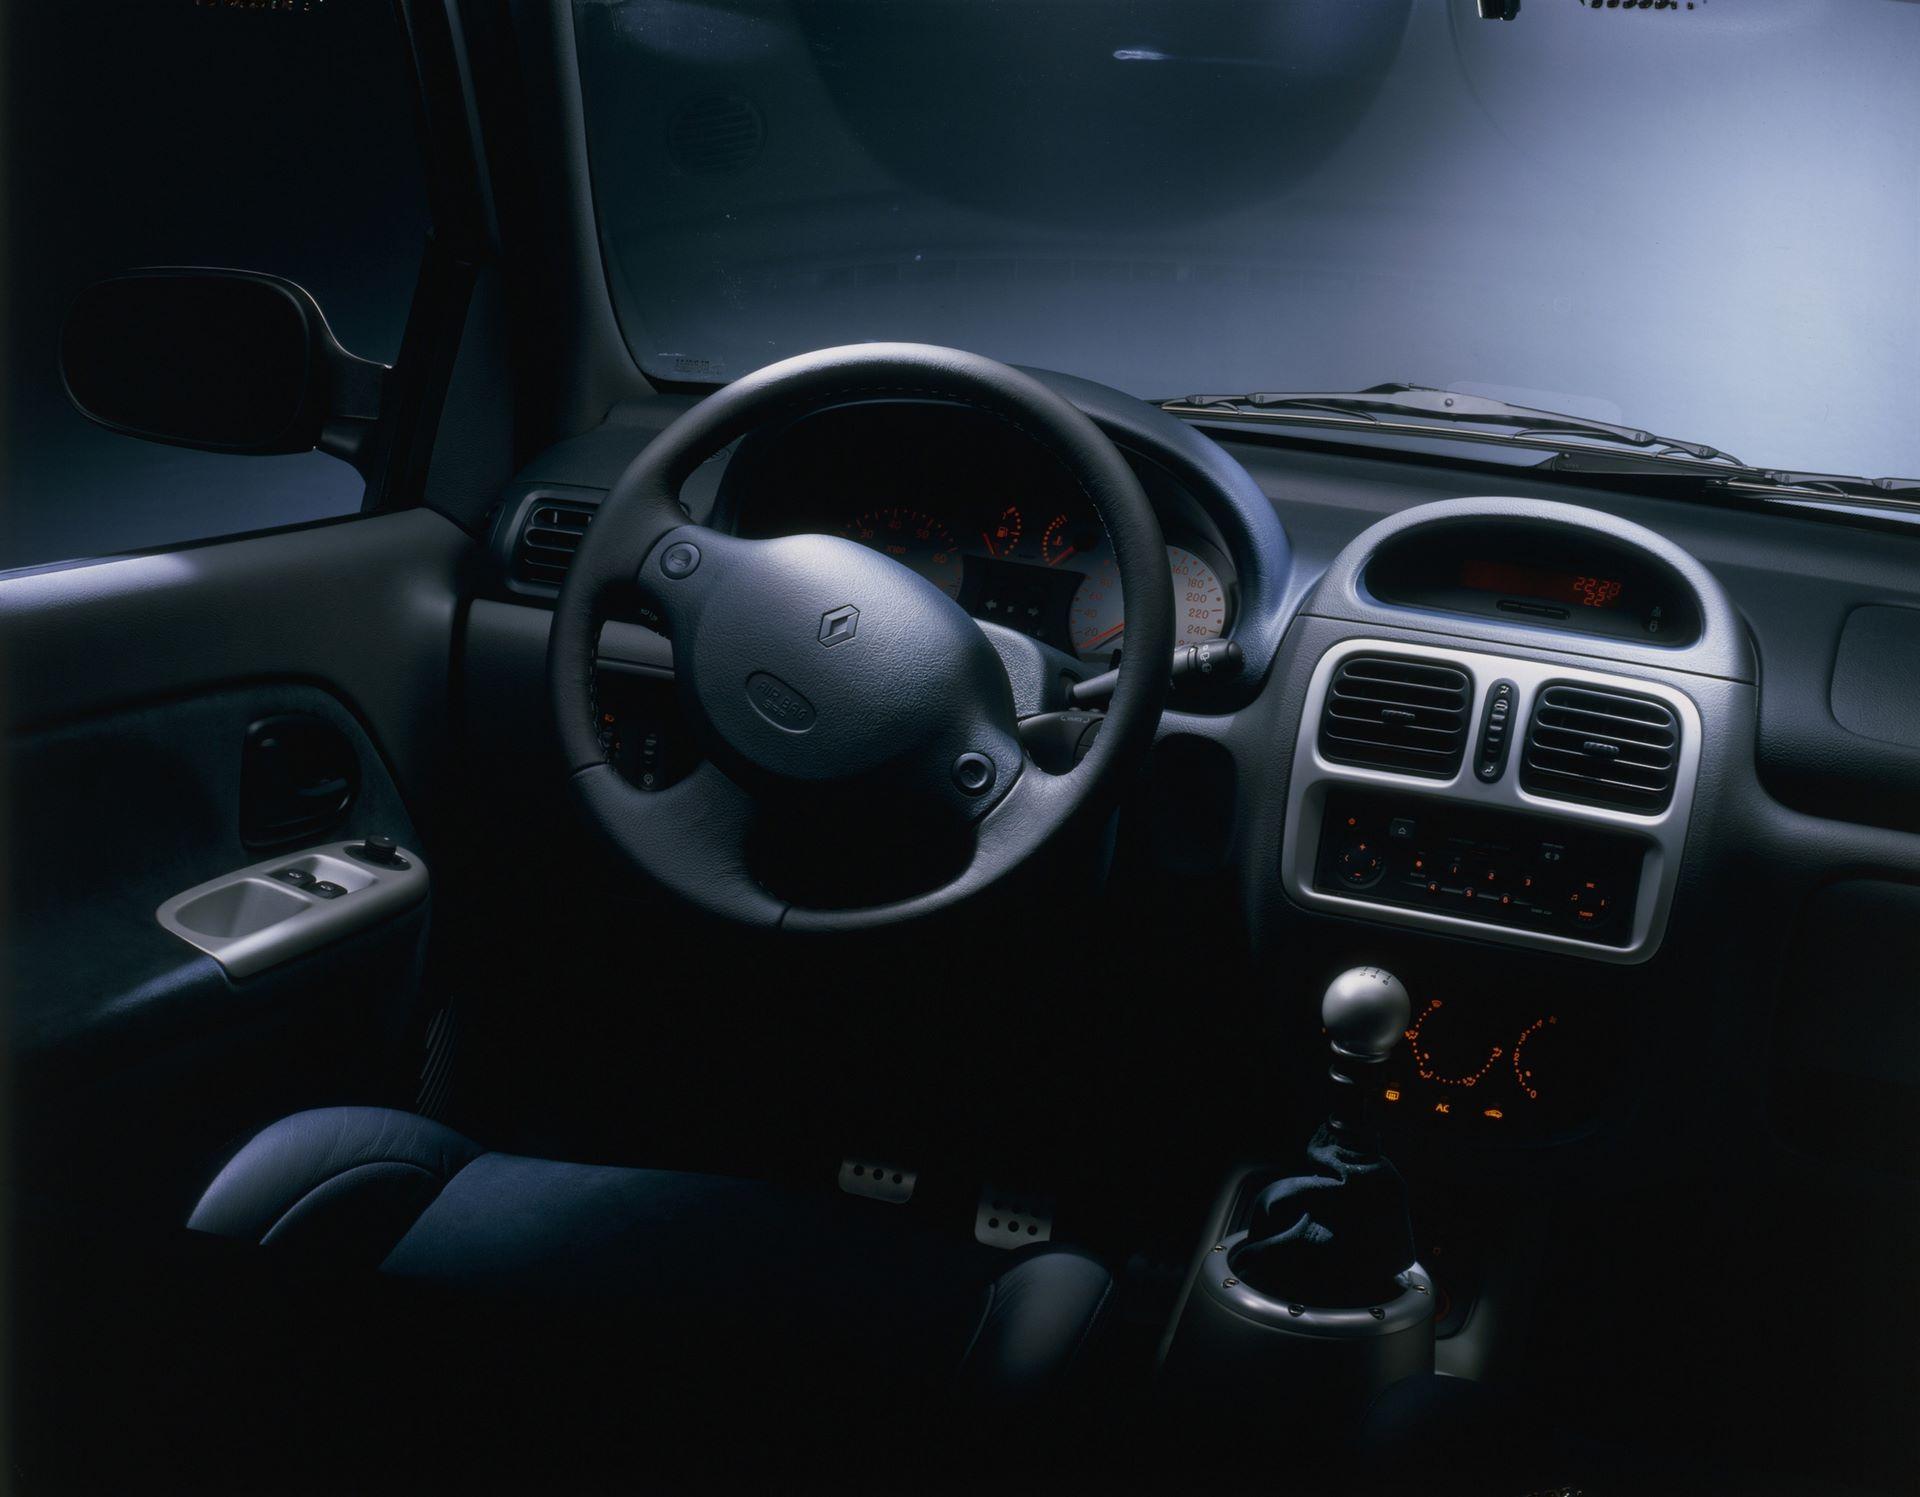 RENAULT CLIO RENAULT SPORT V6 24V IN STUDIO